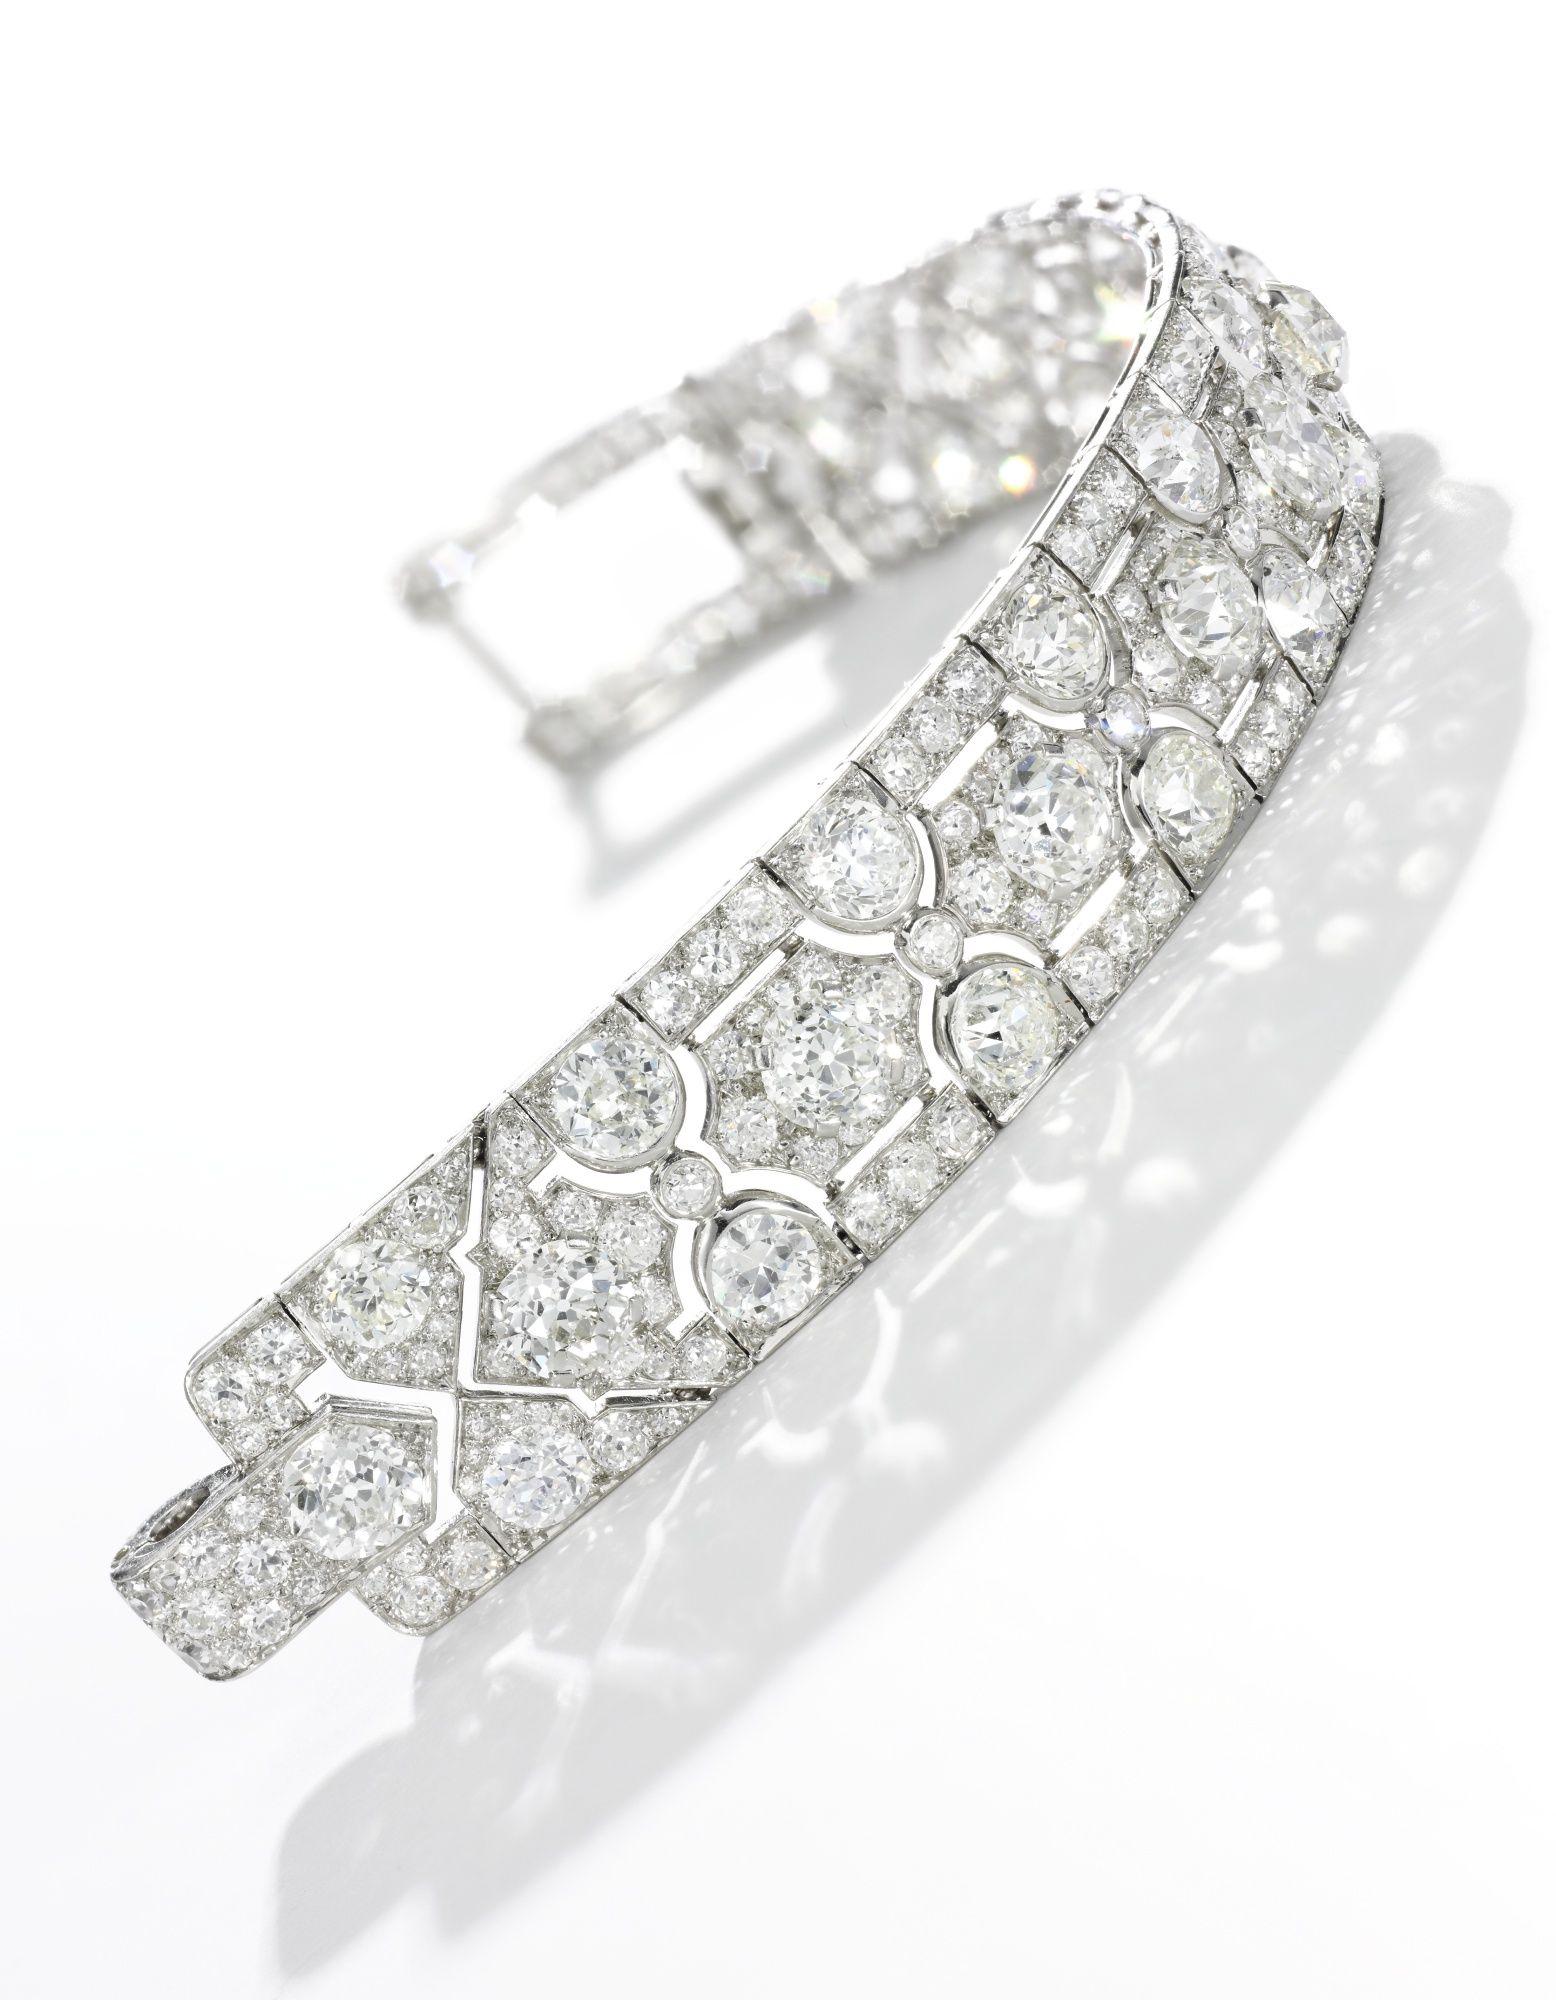 Diamond bracelet cartier s of strap and buckle design